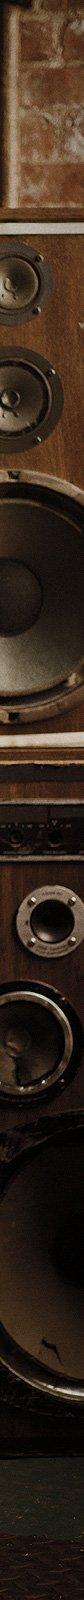 left-is-84x1600